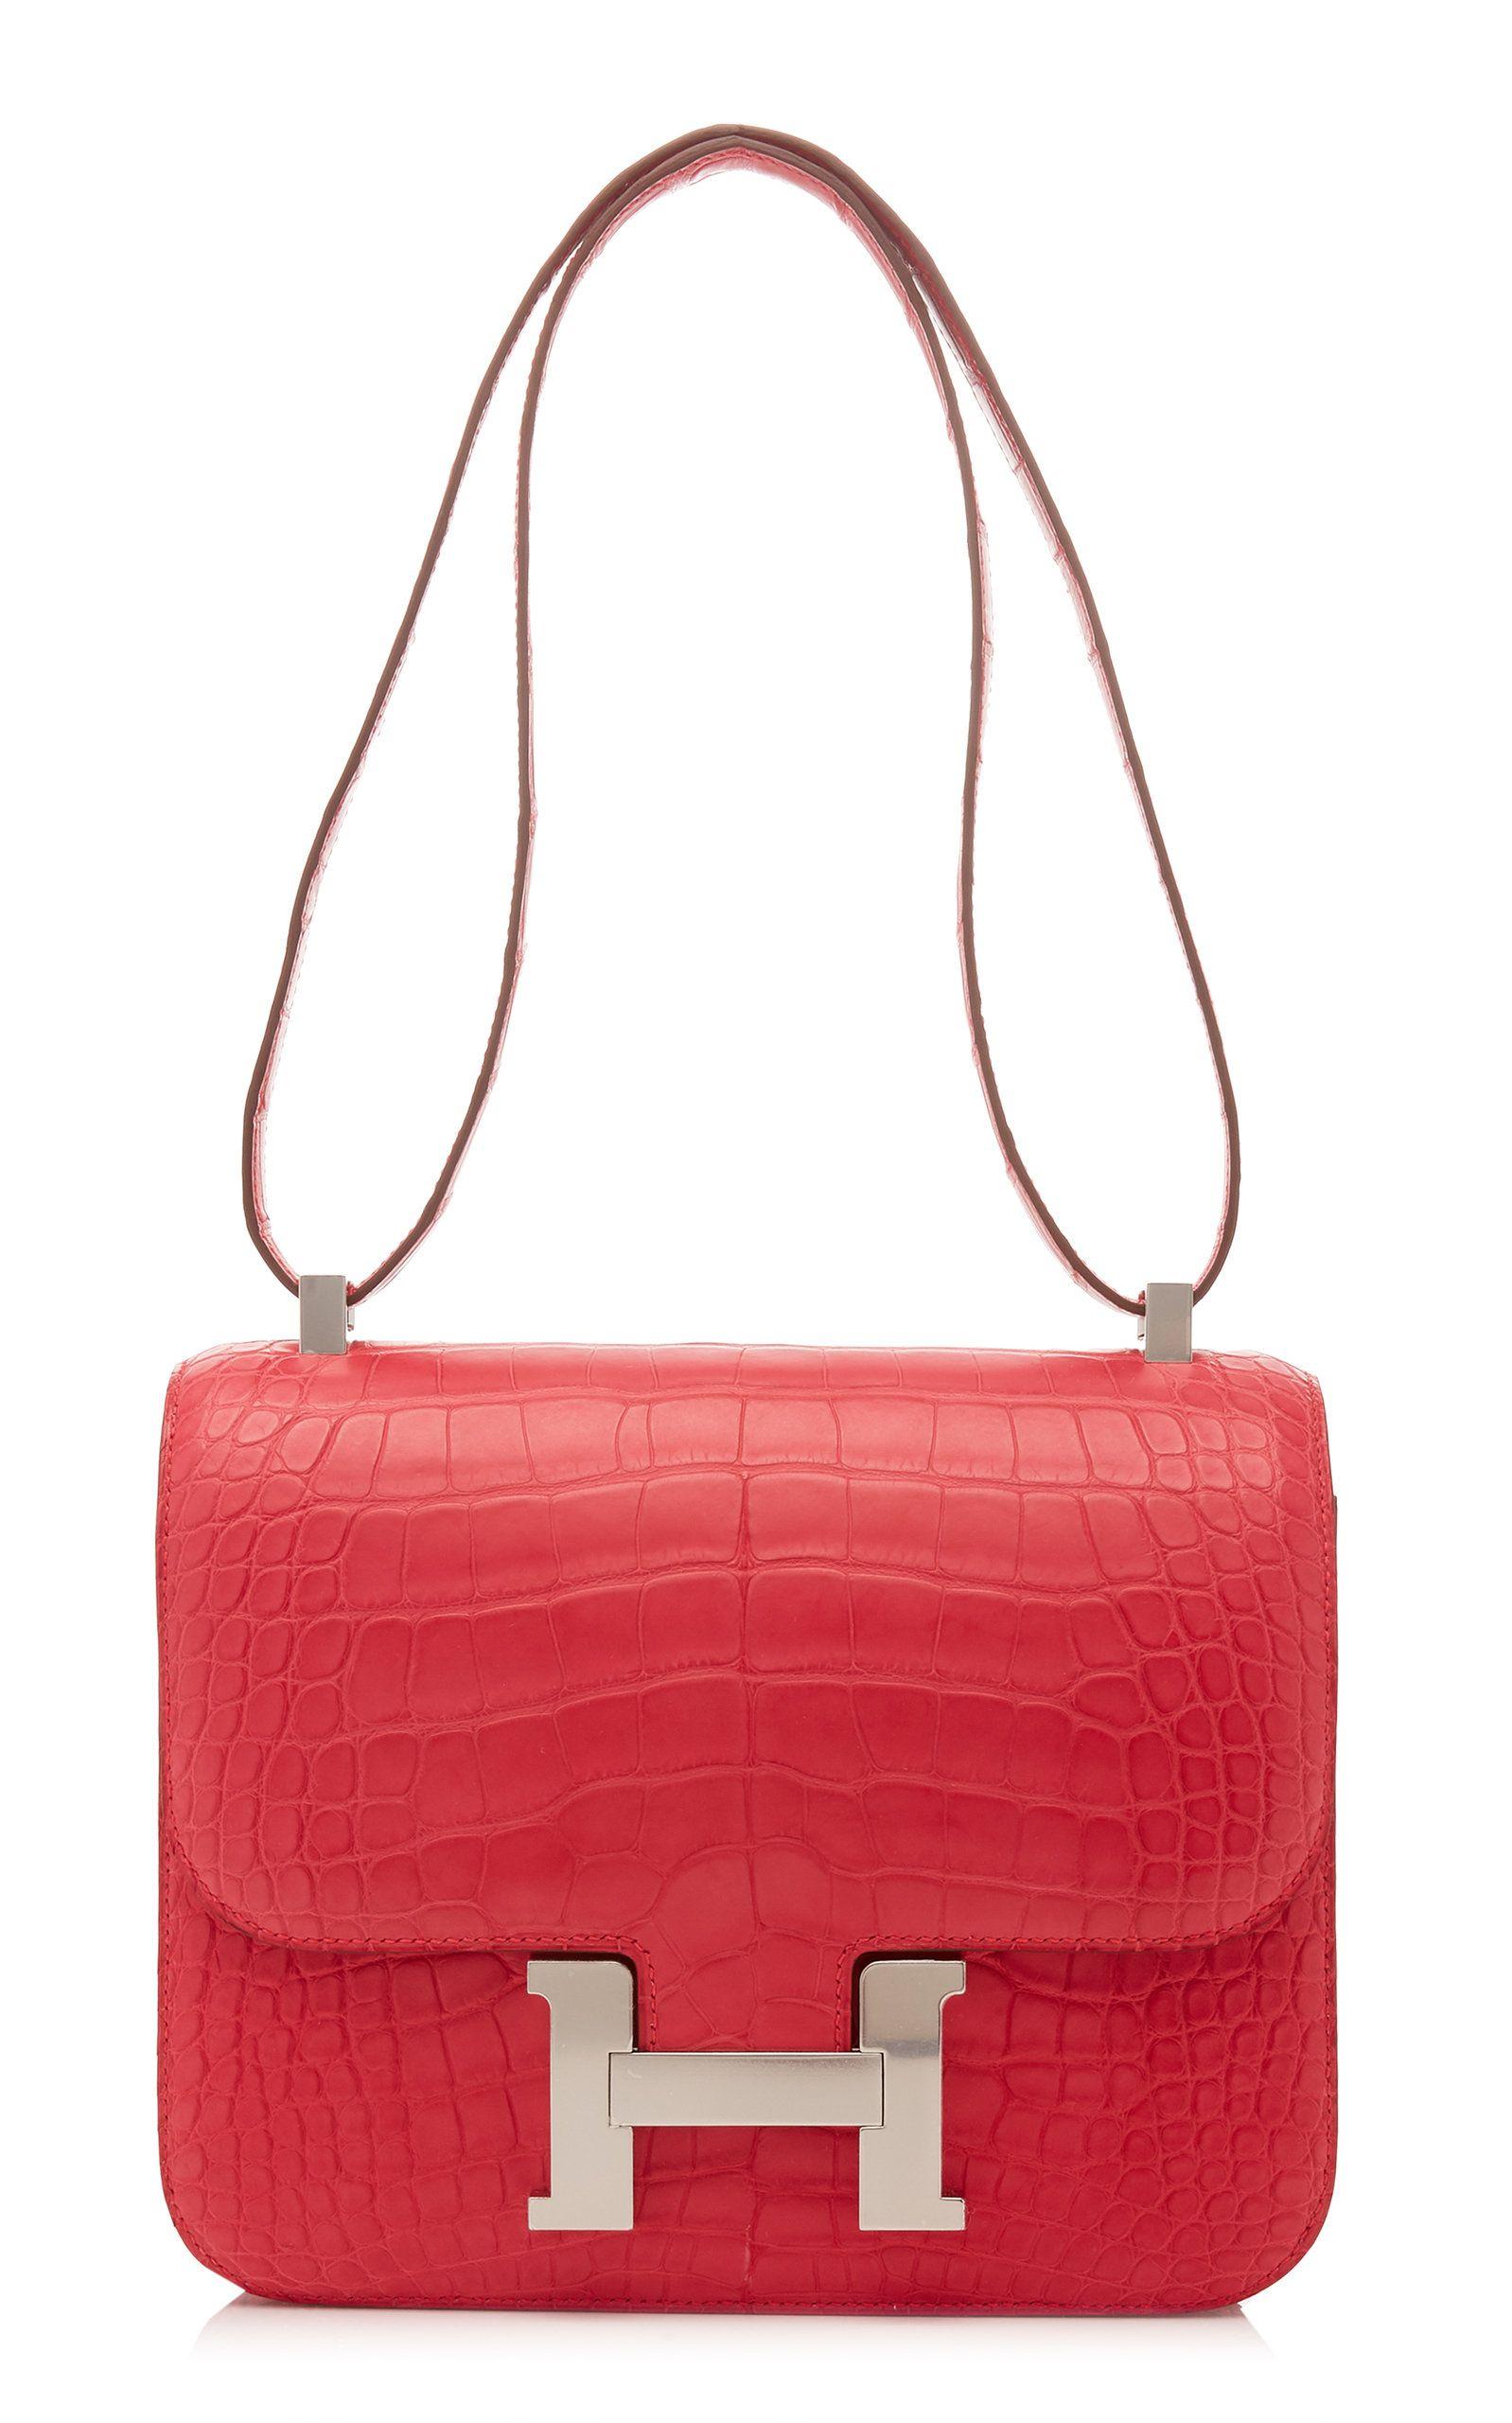 8e5f9084a1 Hermès 24cm Rose Extreme Matte Alligator Constance